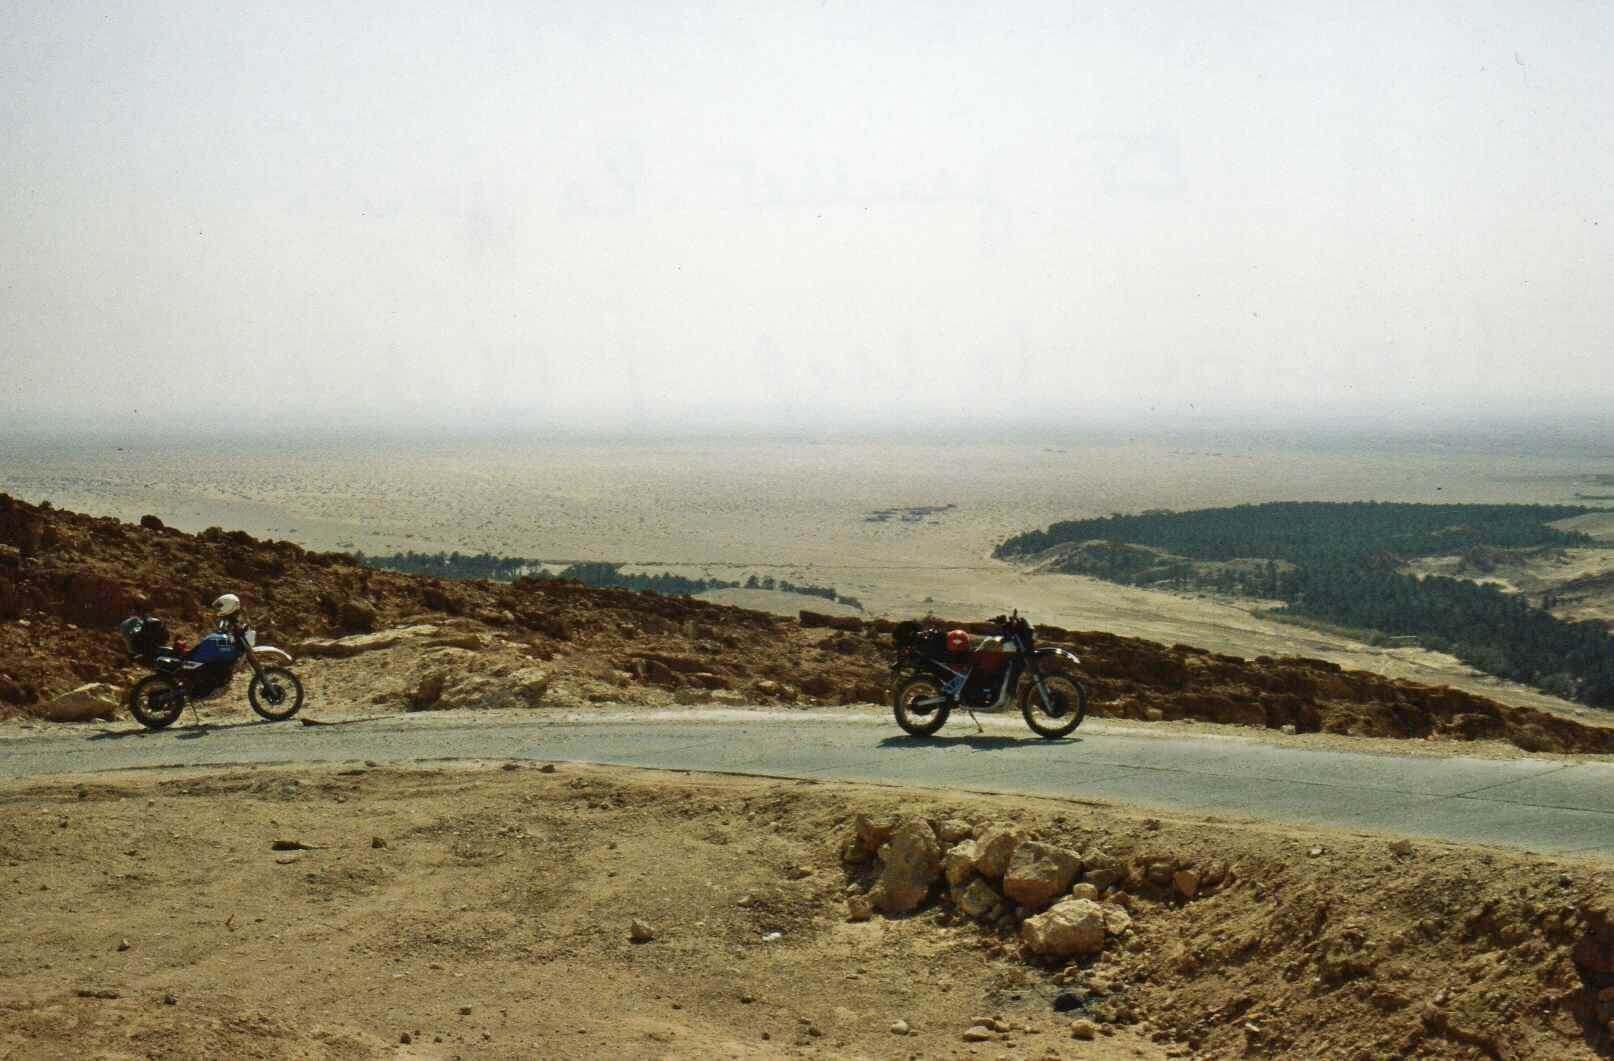 Raid moto 4x4 Tunisie Wild Spot El Kef Chebika - Oasis Chebika